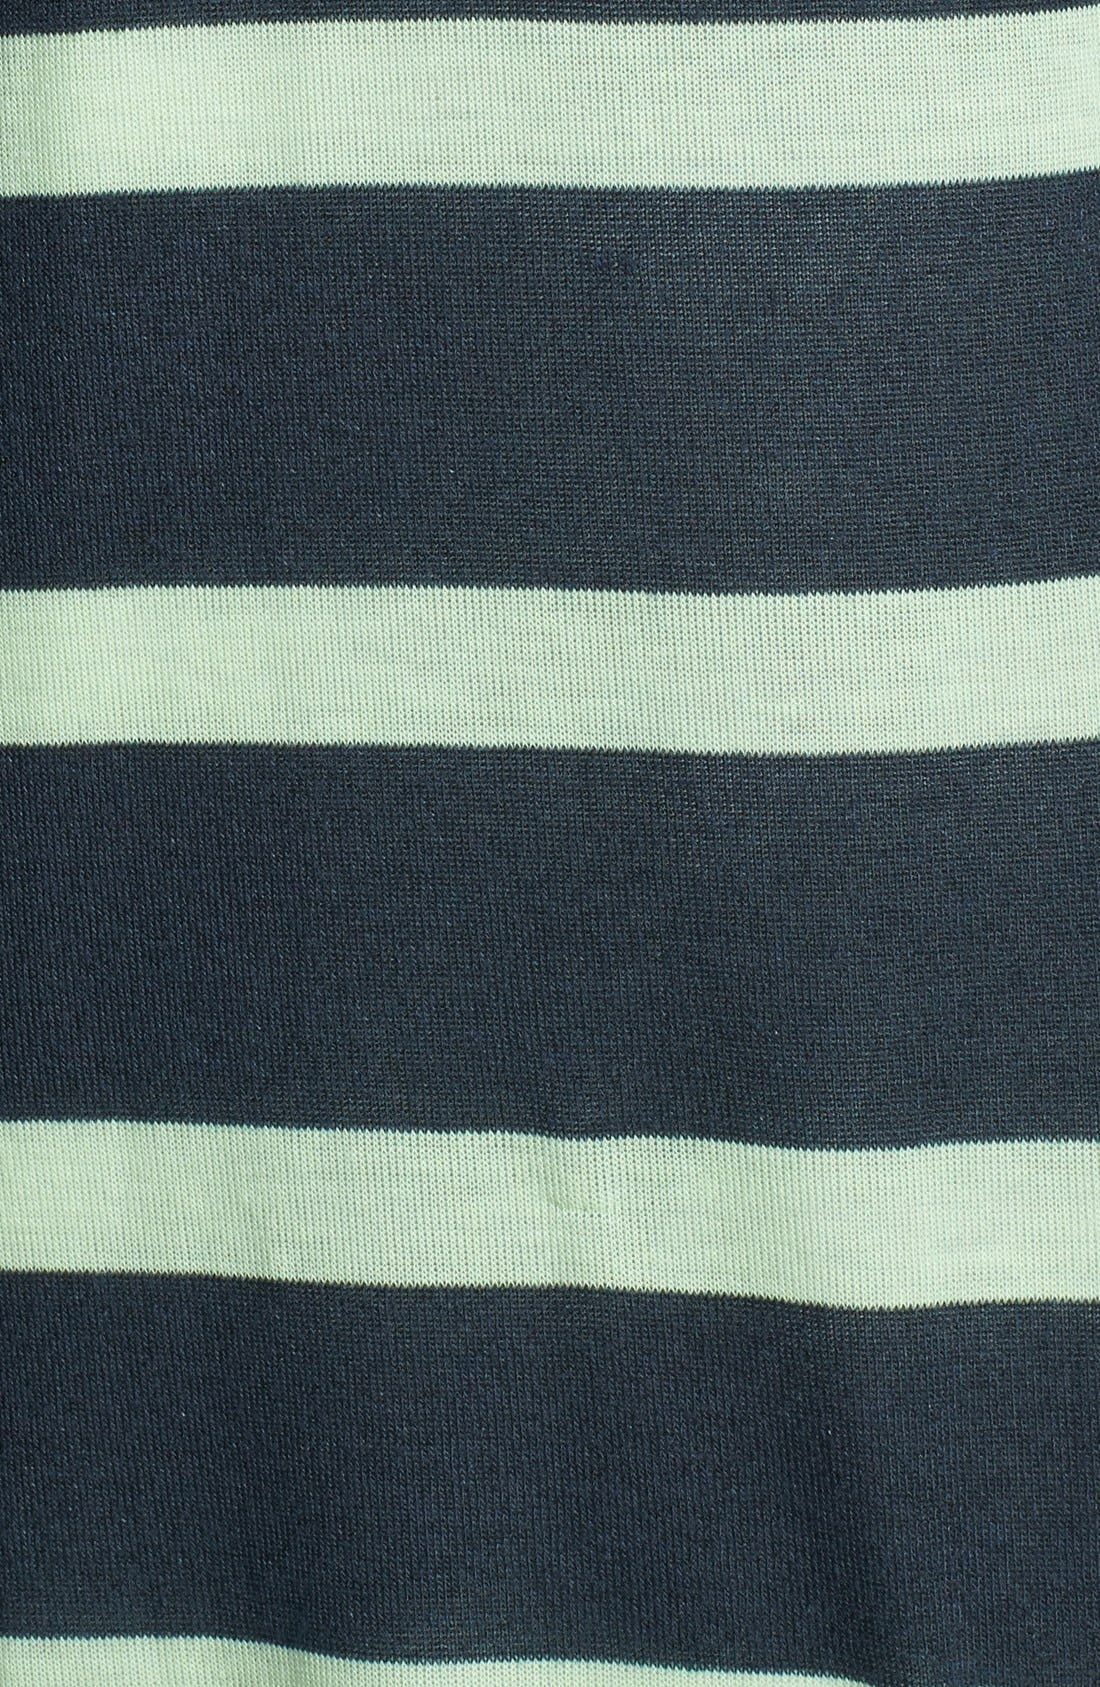 Alternate Image 3  - MOD.lusive by Bobeau Open Front Cardigan (Regular & Petite)